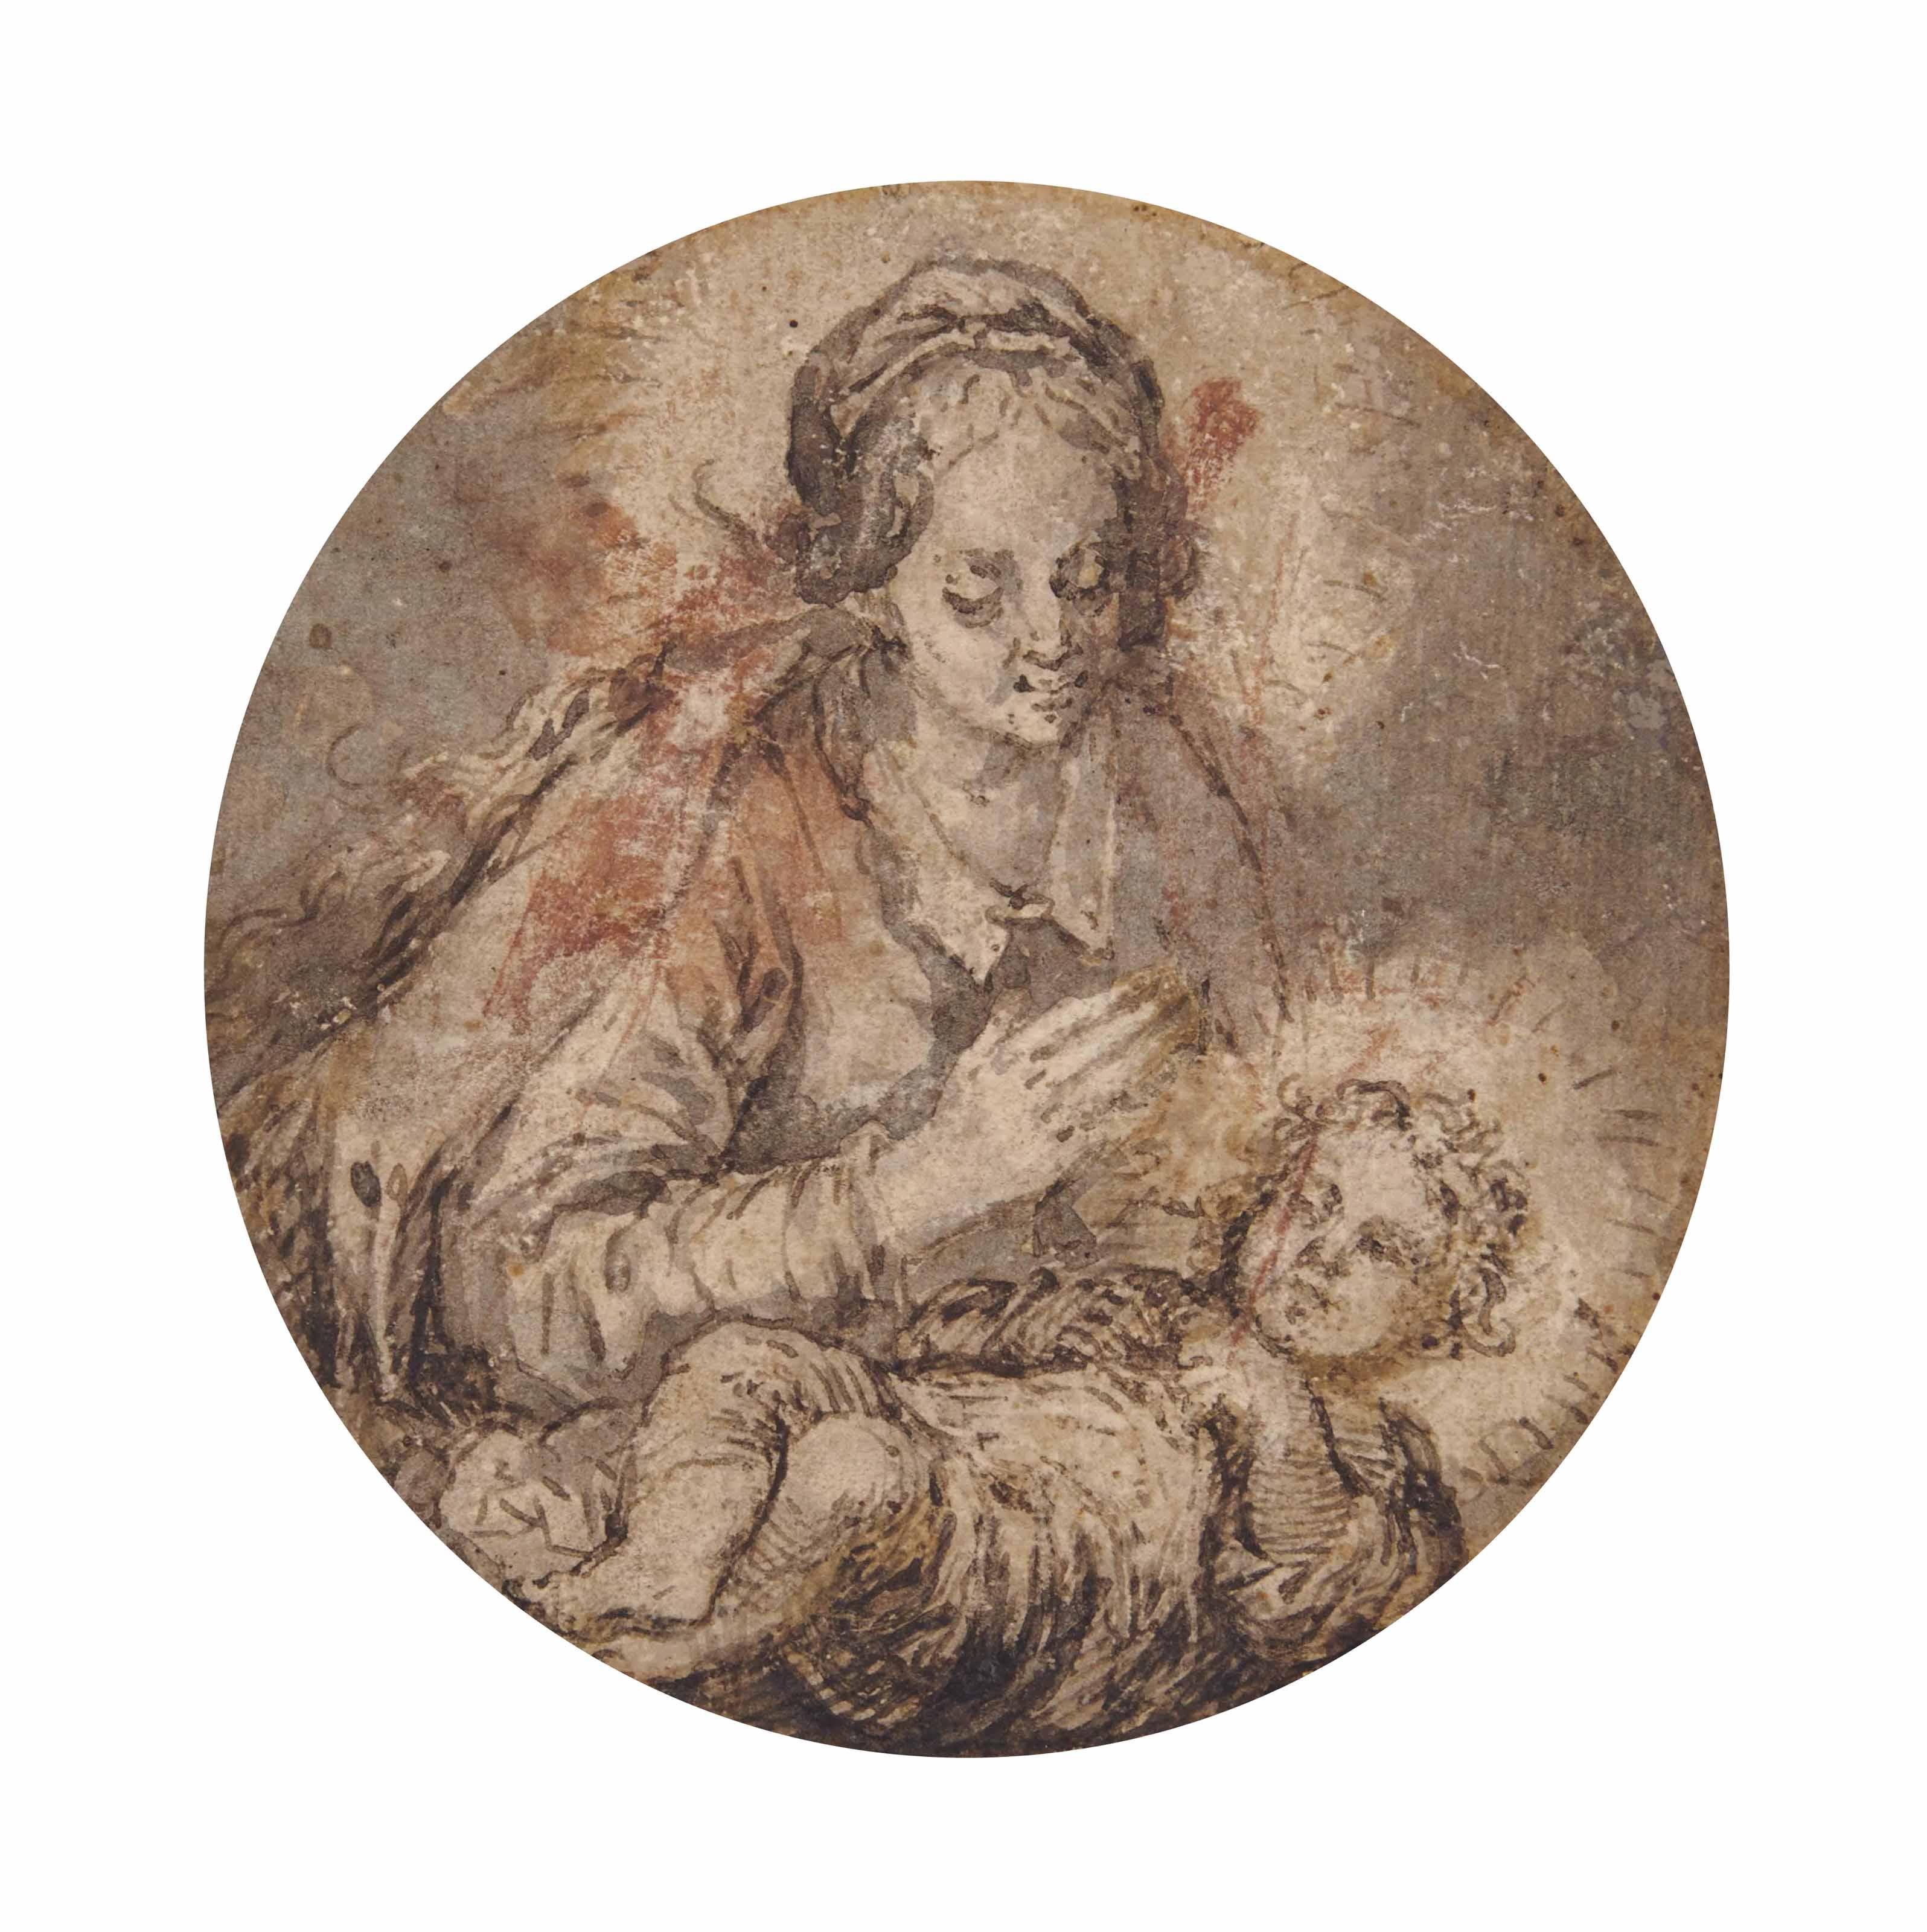 ENTOURAGE D'ABRAHAM BLOEMAERT (1564-1651)